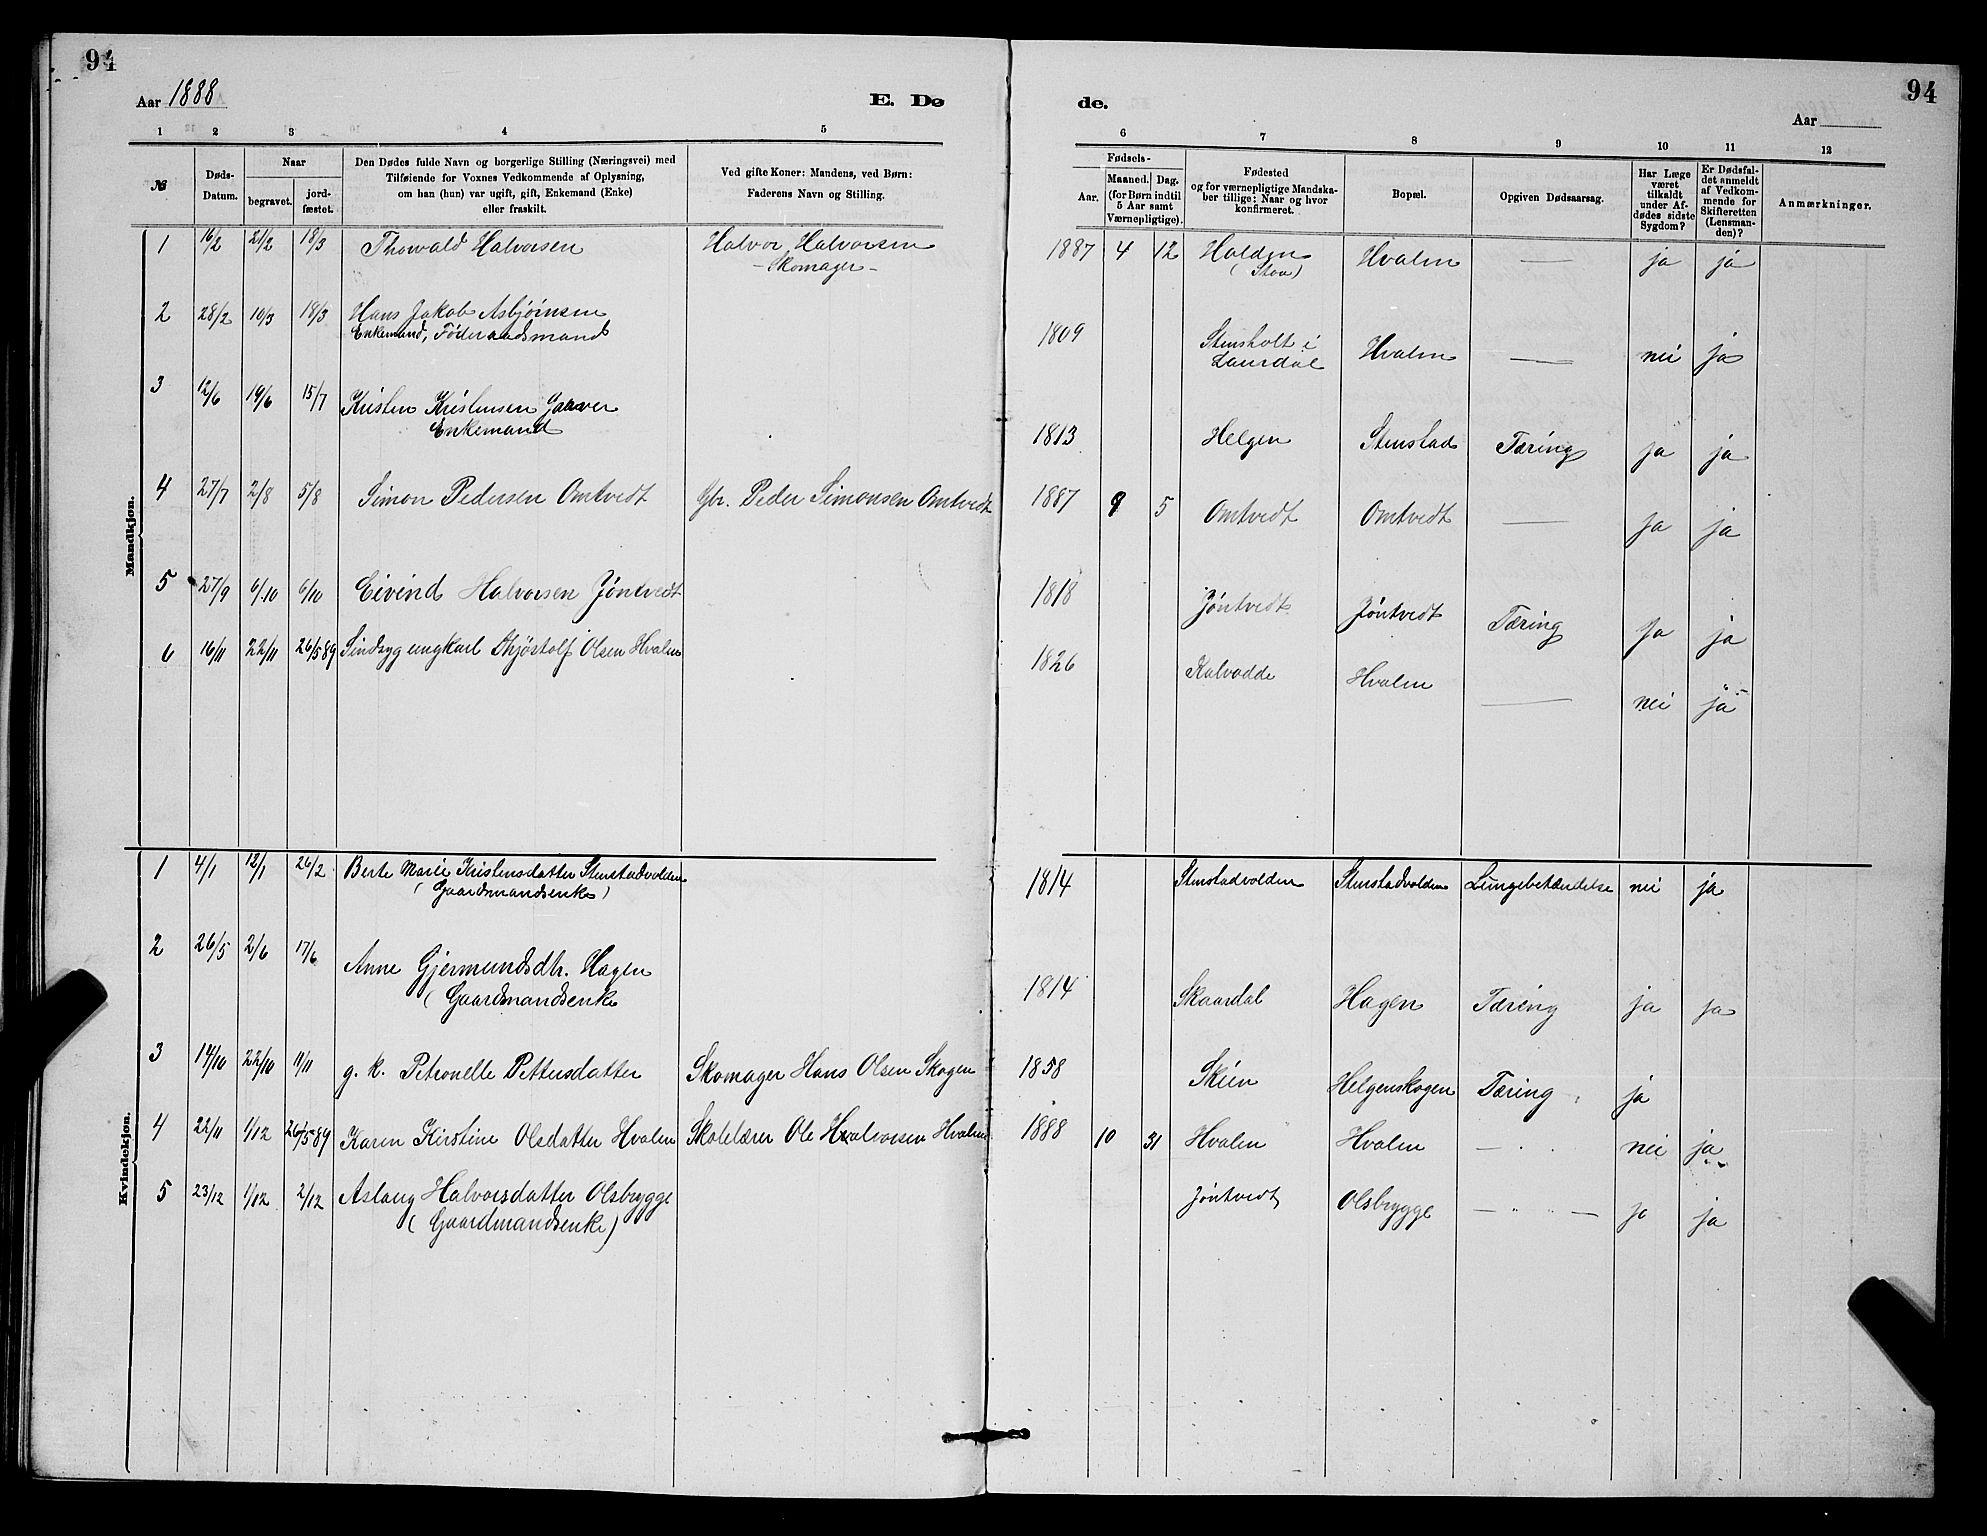 SAKO, Holla kirkebøker, G/Gb/L0001: Klokkerbok nr. II 1, 1882-1897, s. 94